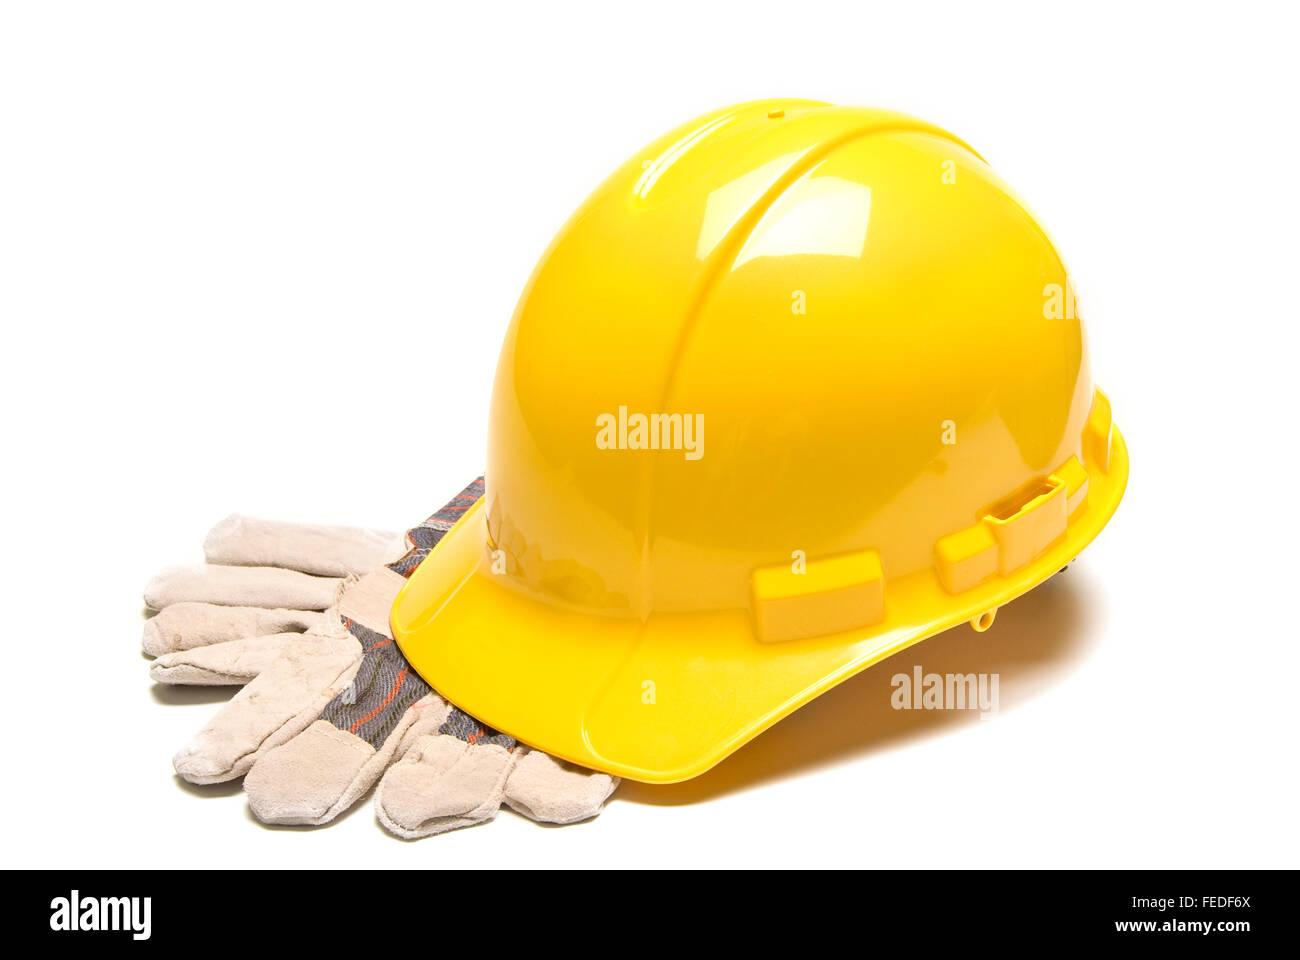 Hard Hat and Work Gloves Horizontal - Stock Image